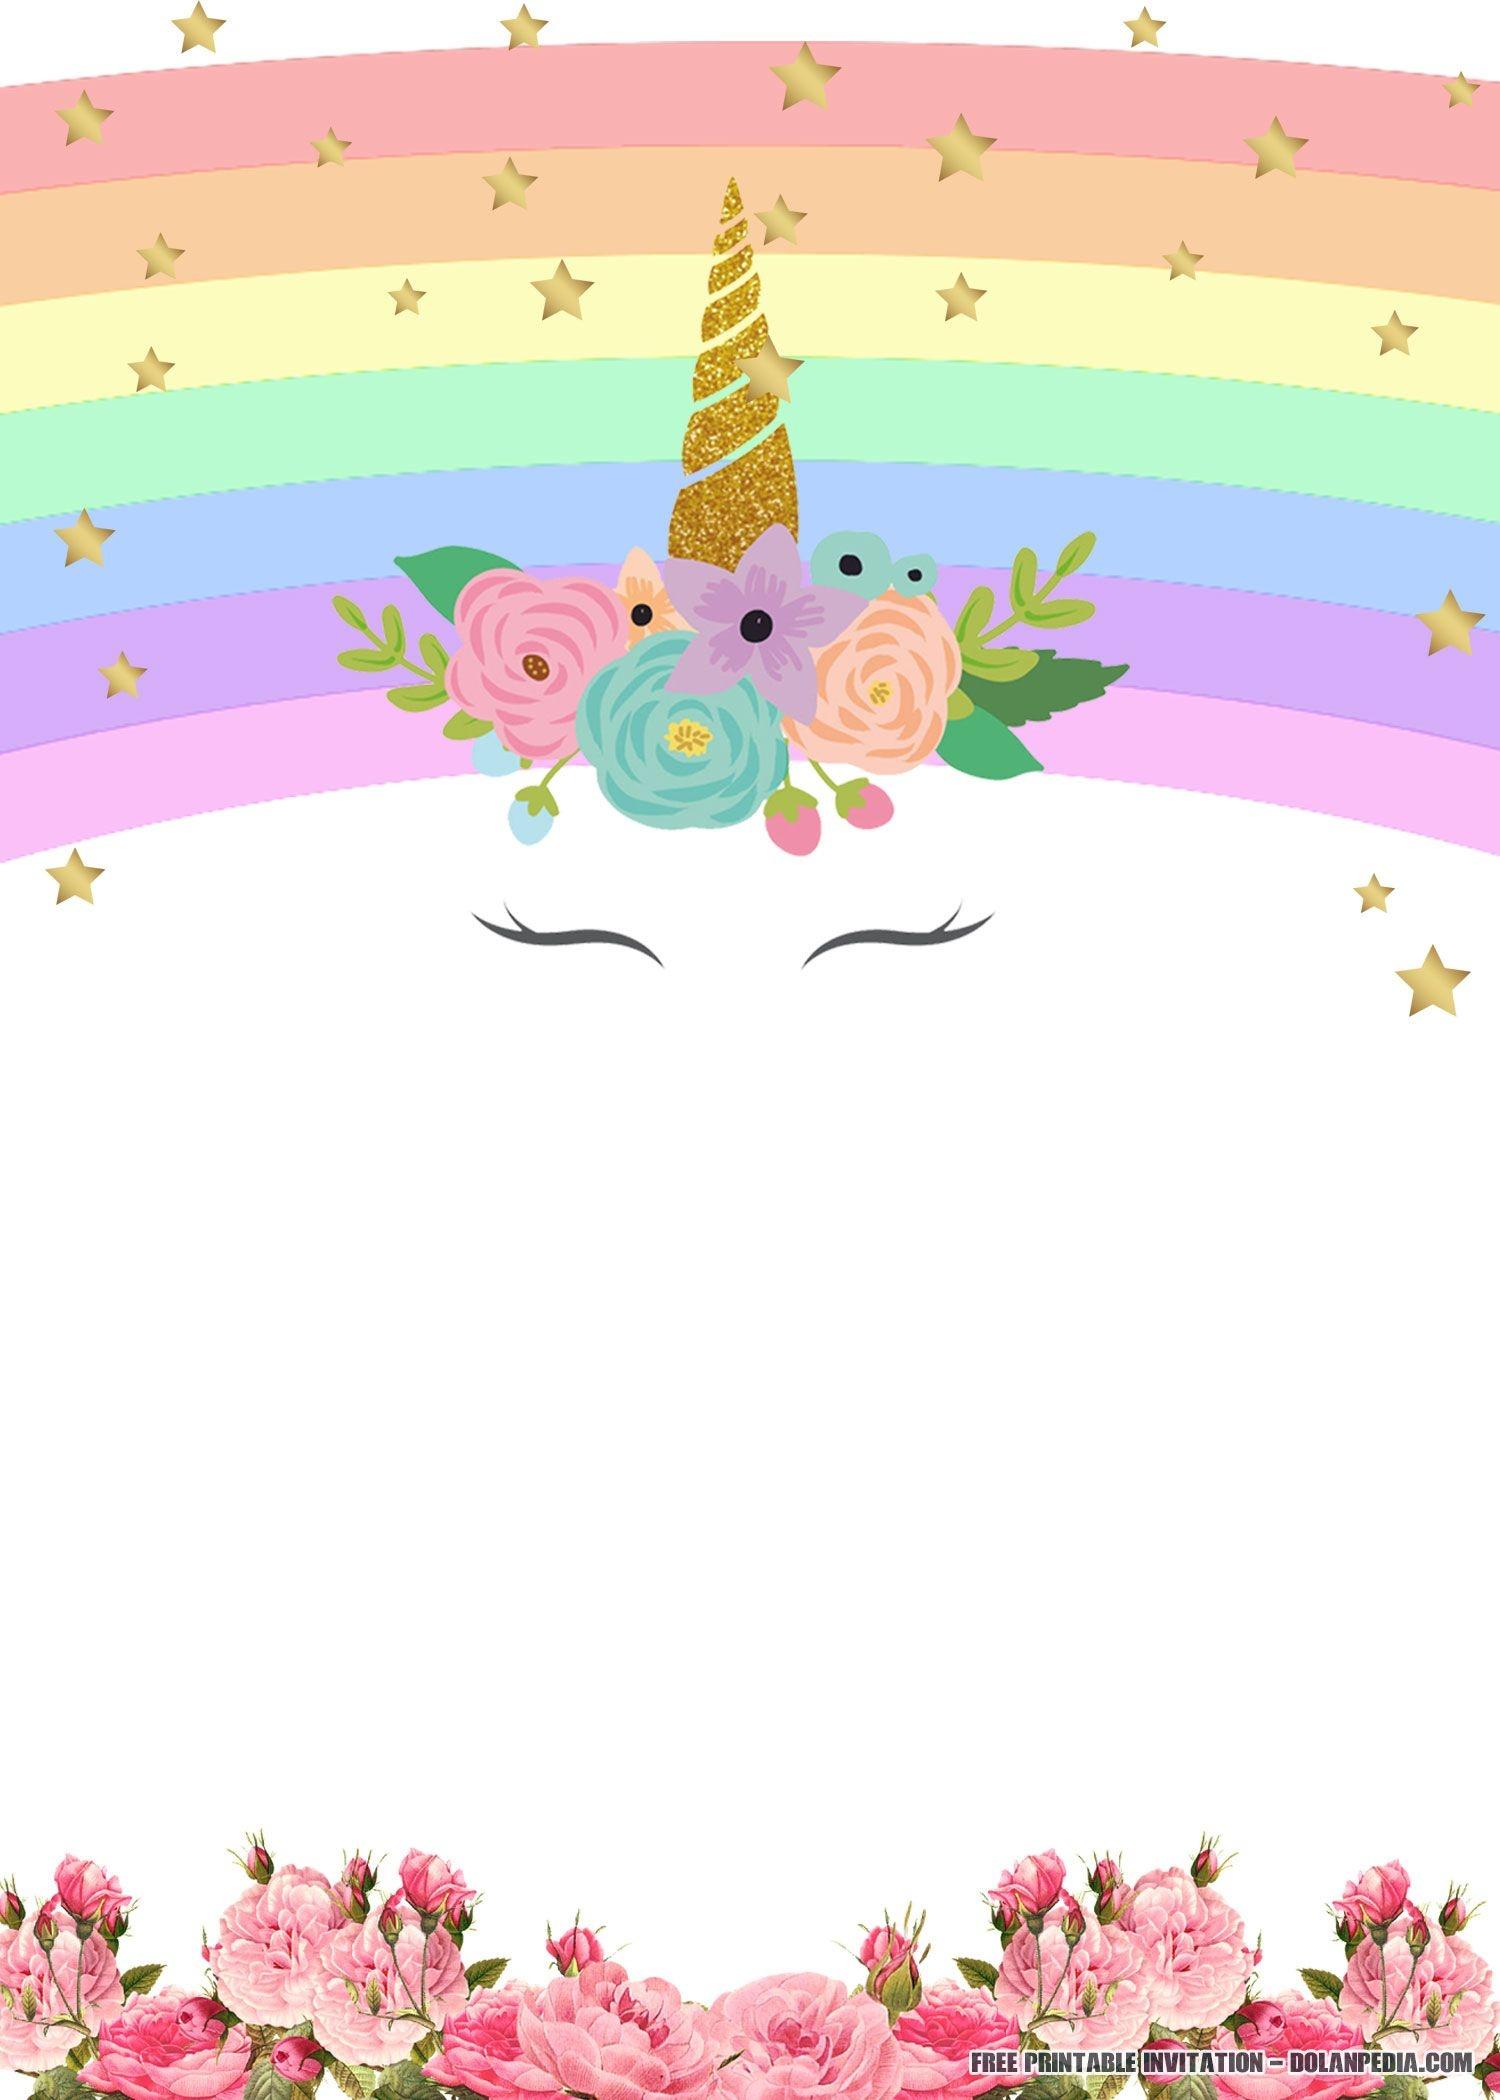 Free Printable Golden Unicorn Birthday Invitation Template | Unicorn - Free Printable Unicorn Invitations